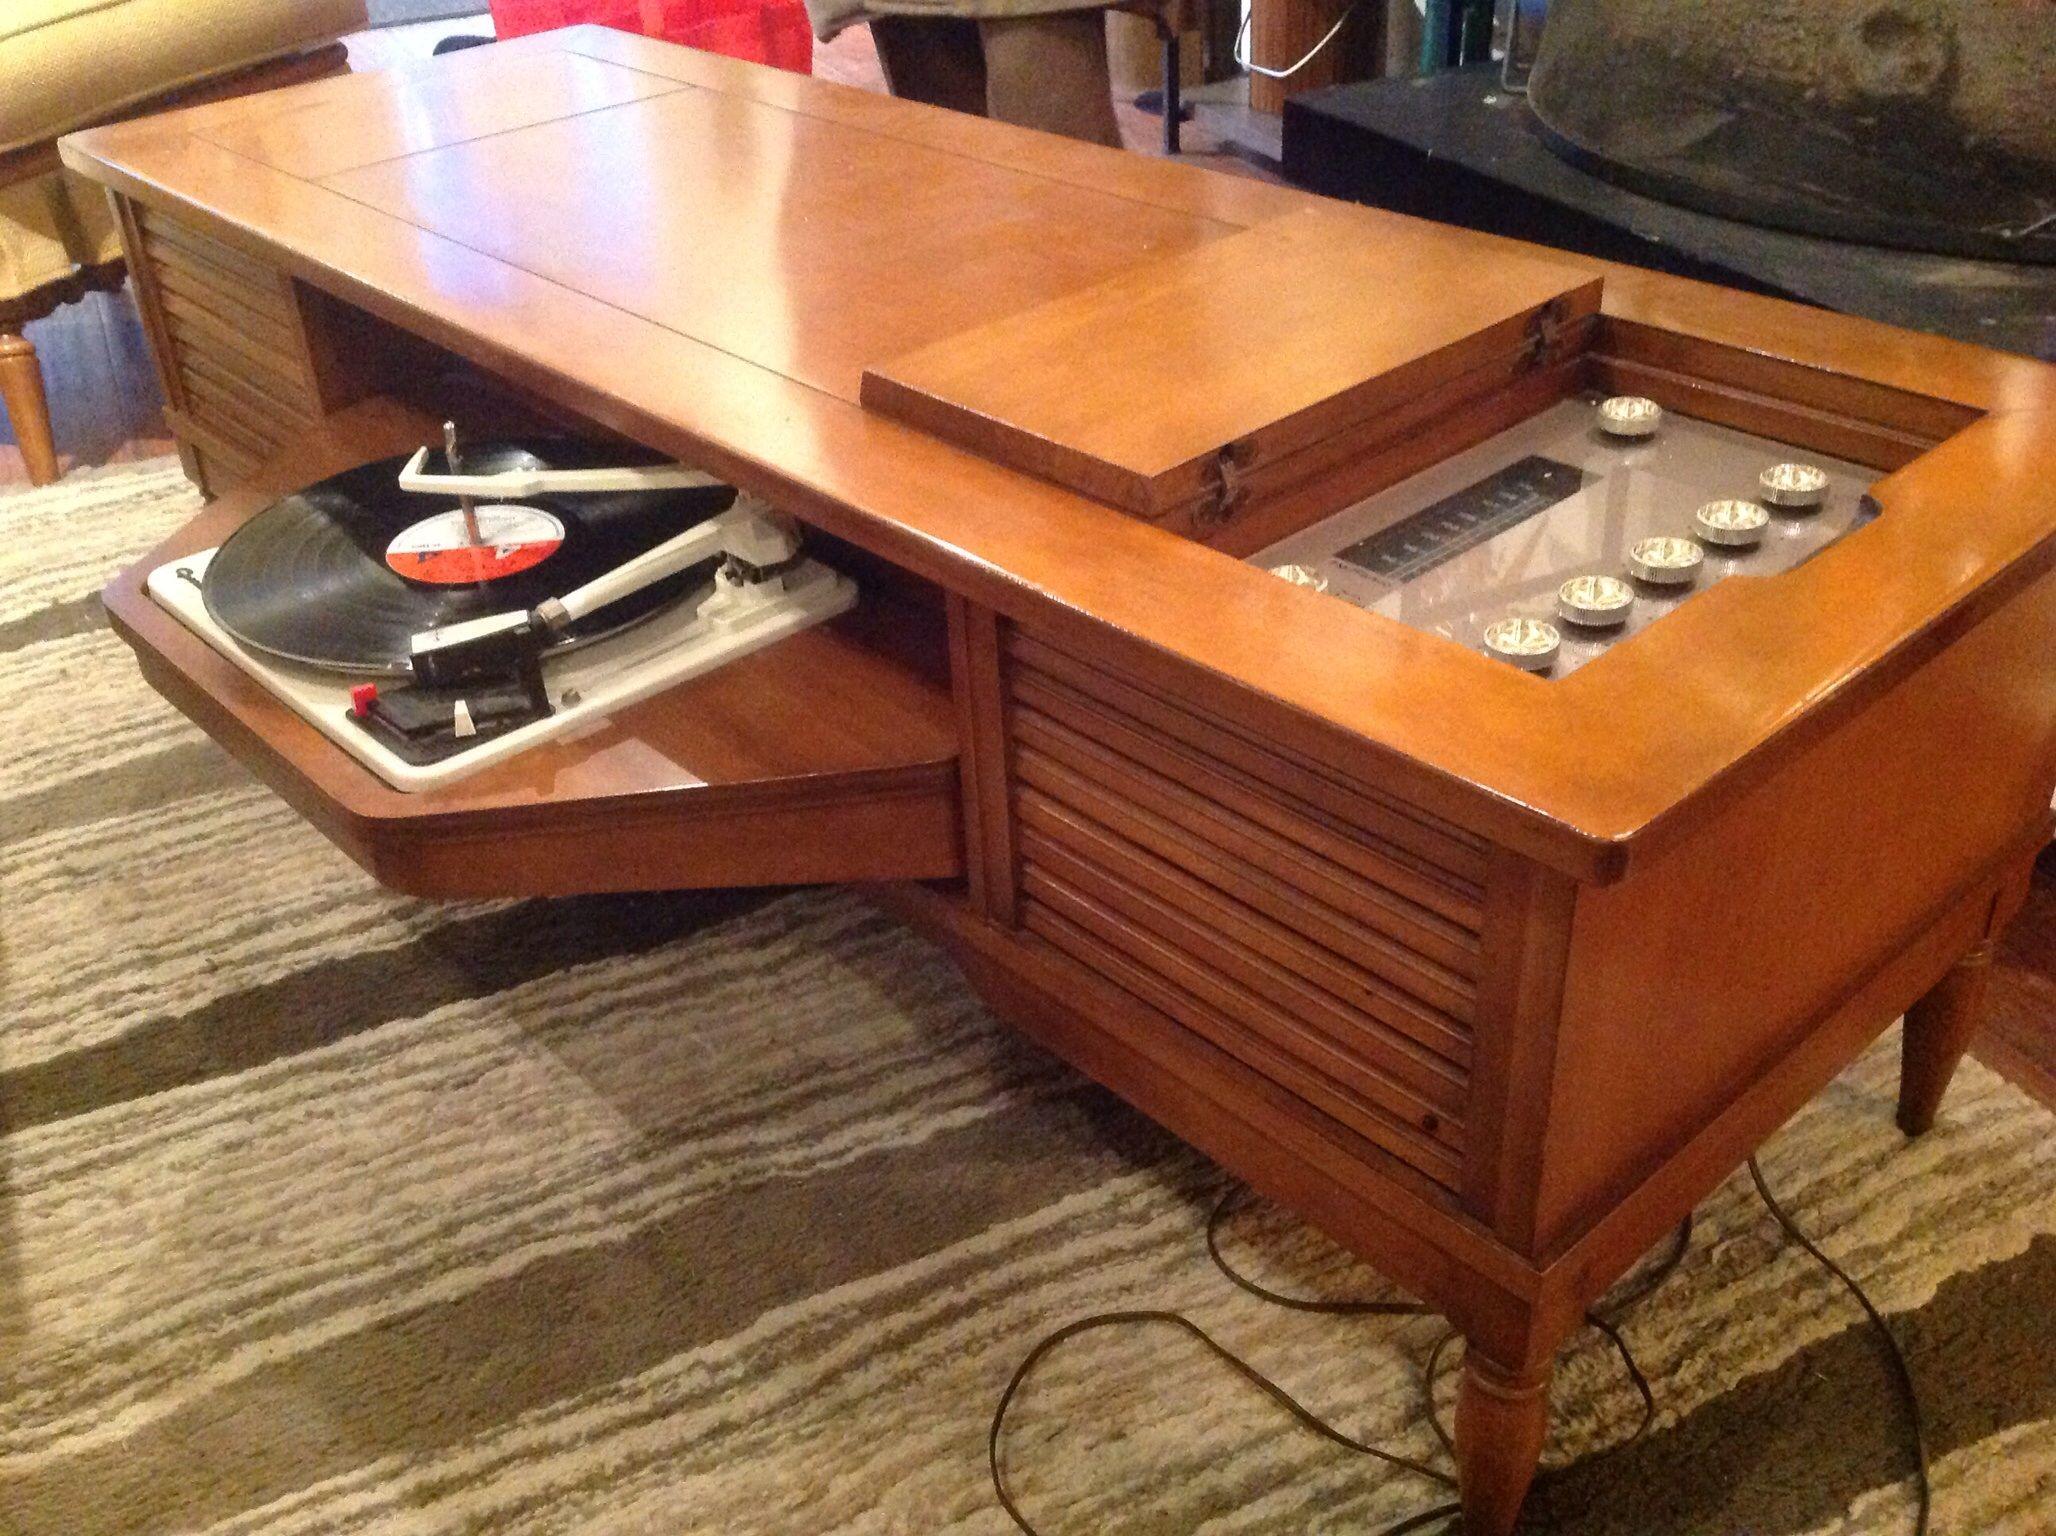 60s Swingaway Coffee Table Record Player Vintage Stereo Console Stereo Cabinet Stereo Console